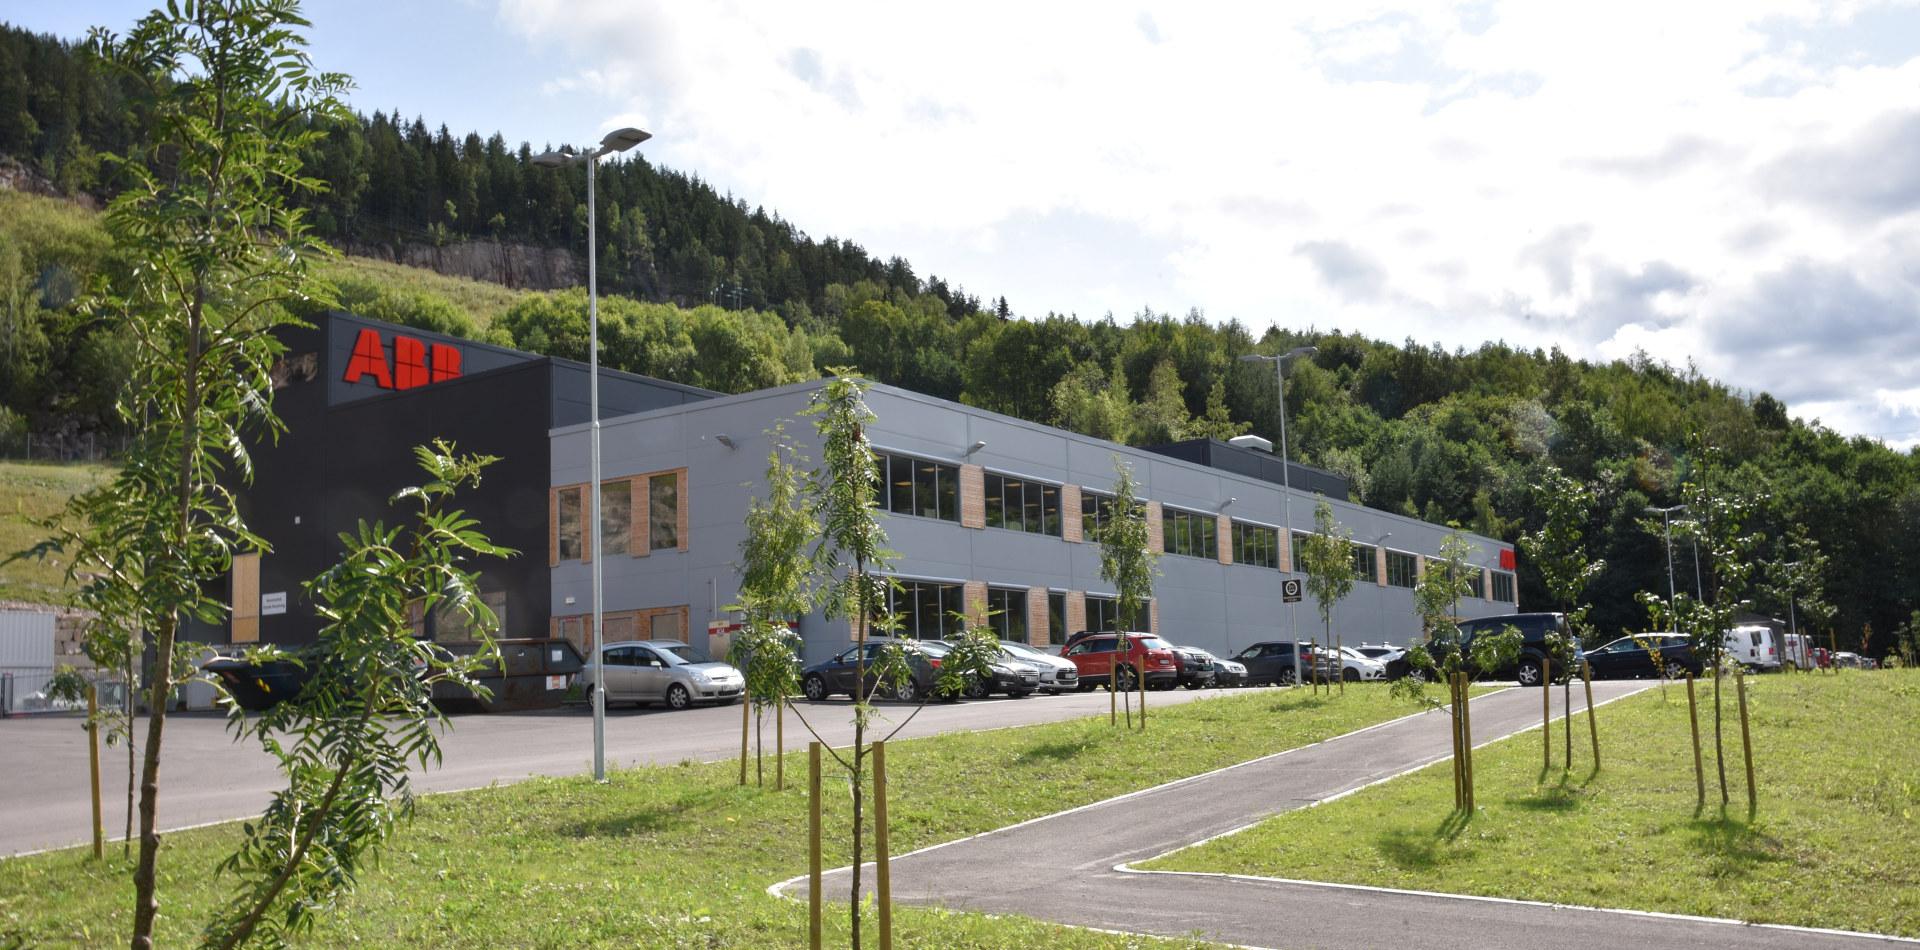 ABBs nye servicesenter i Drammen